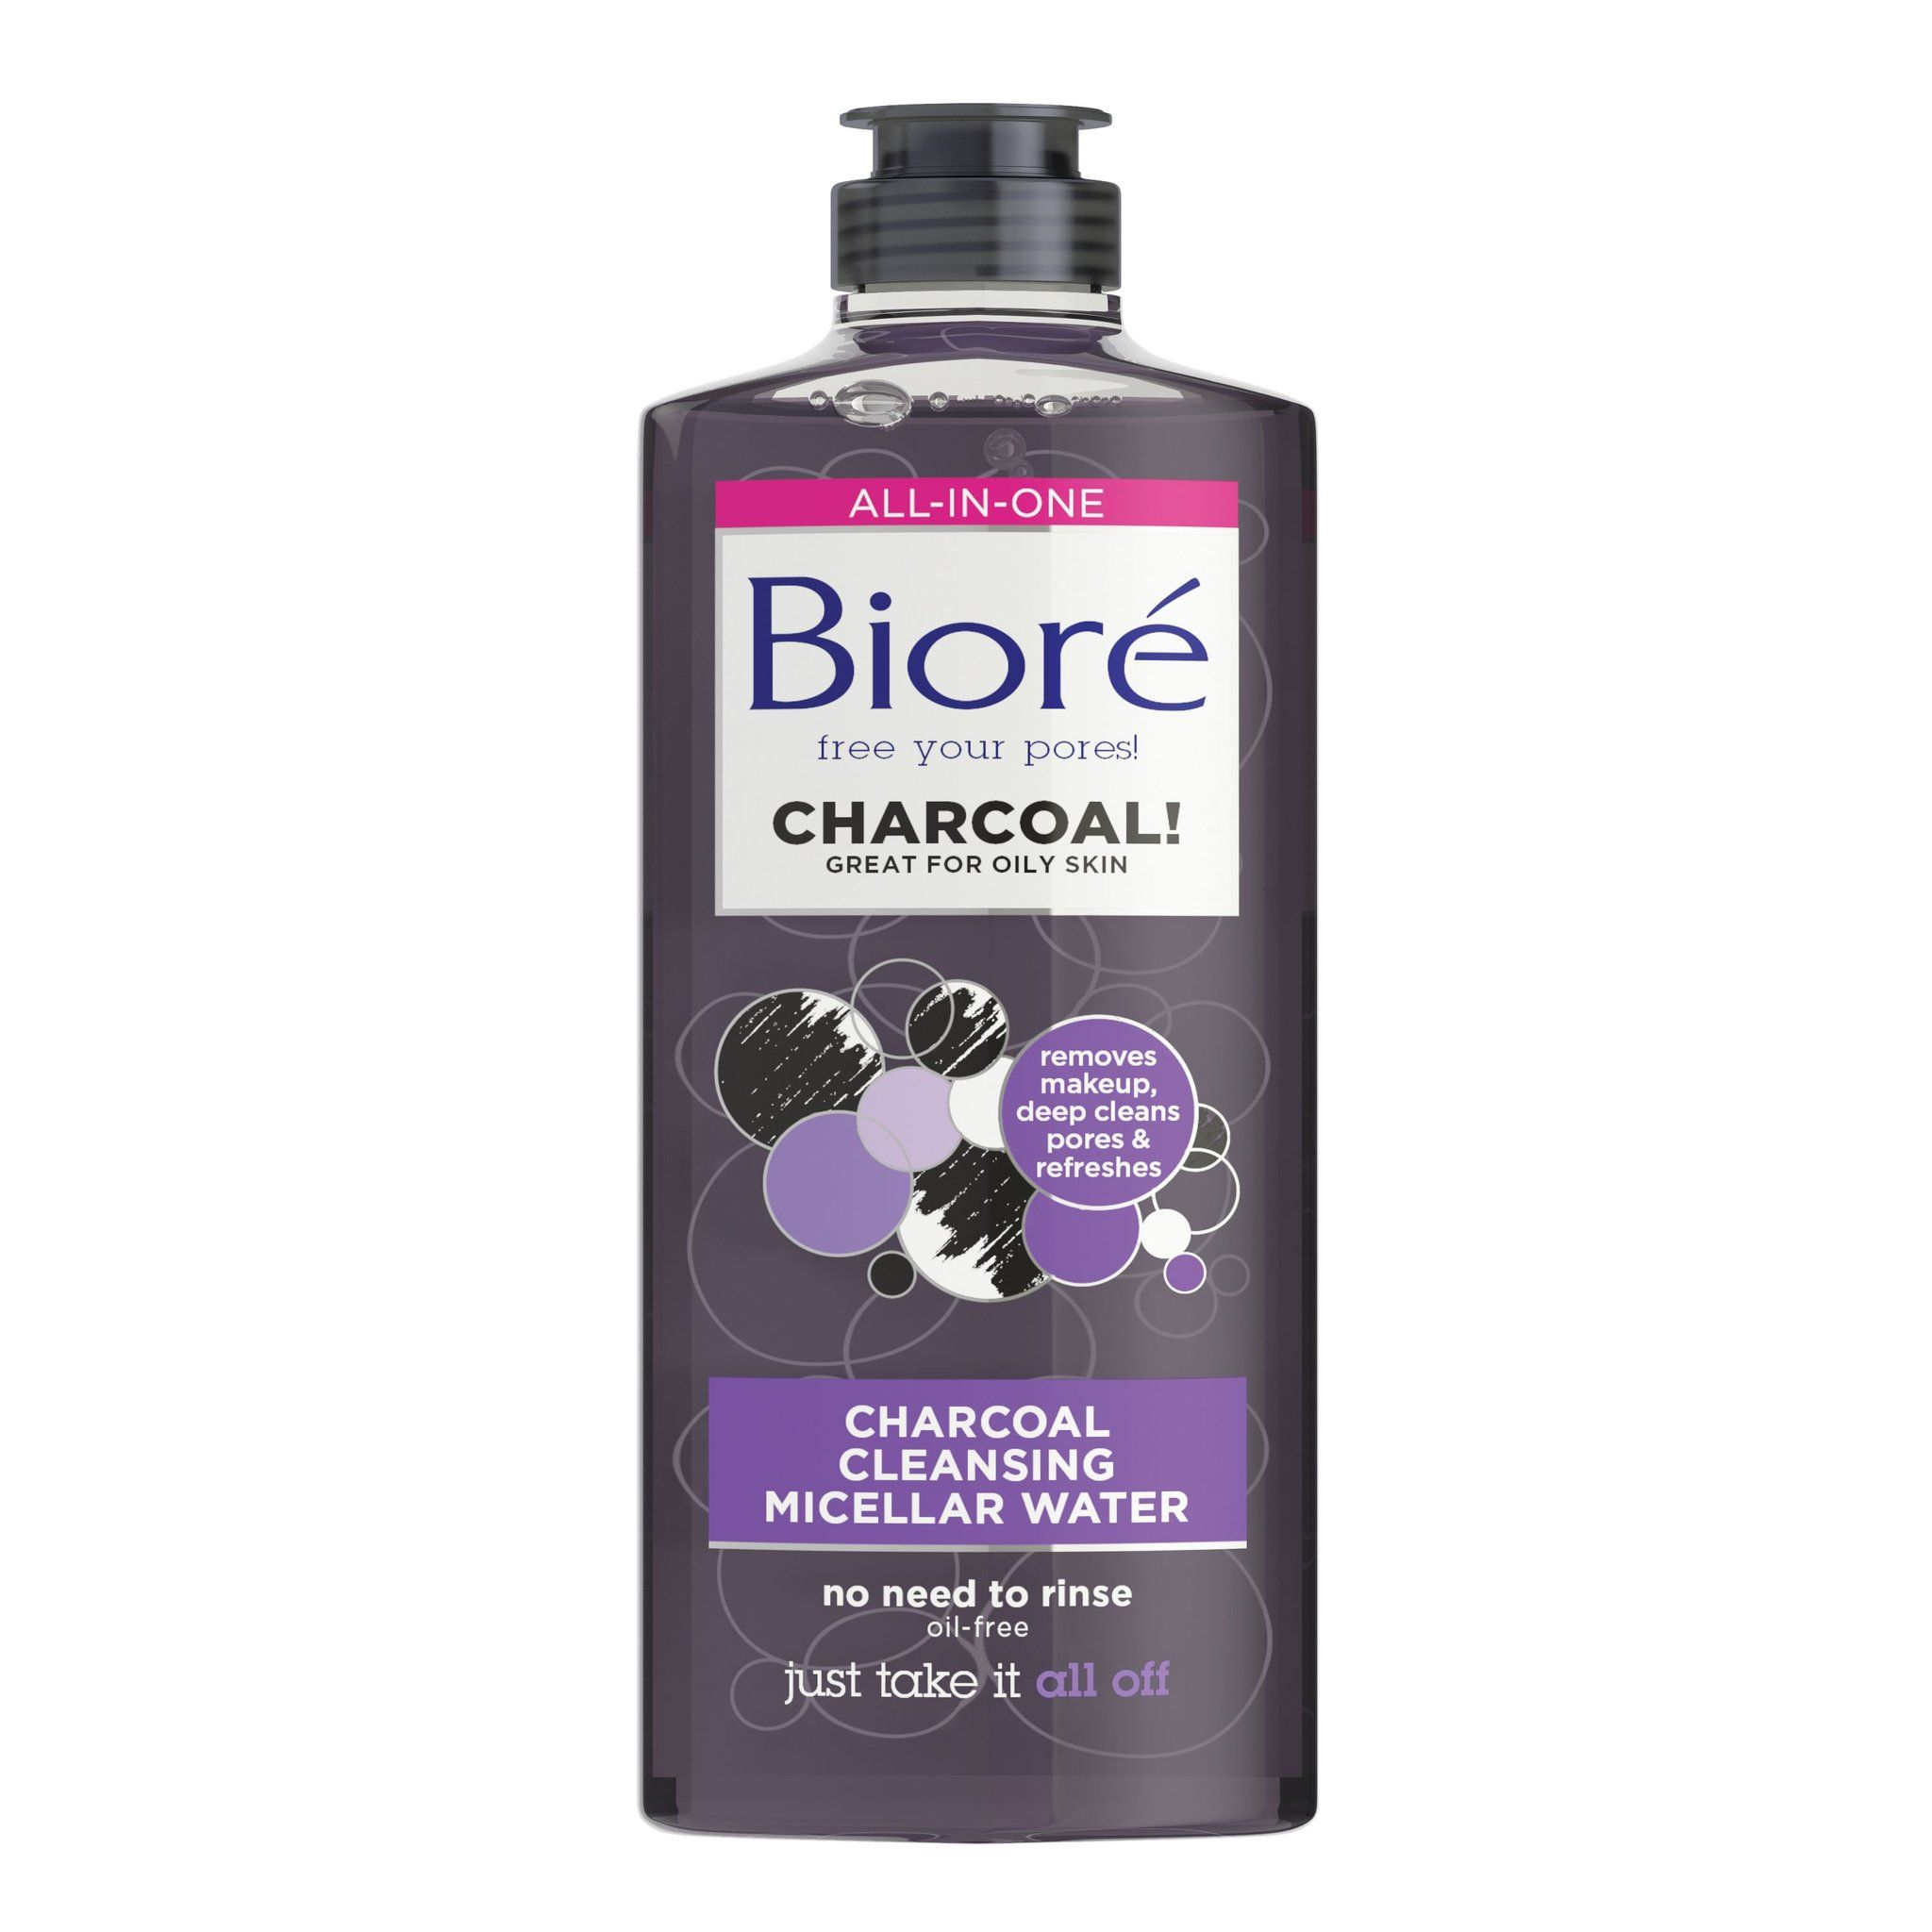 Bioré Charcoal Cleansing Micellar Water Micellar